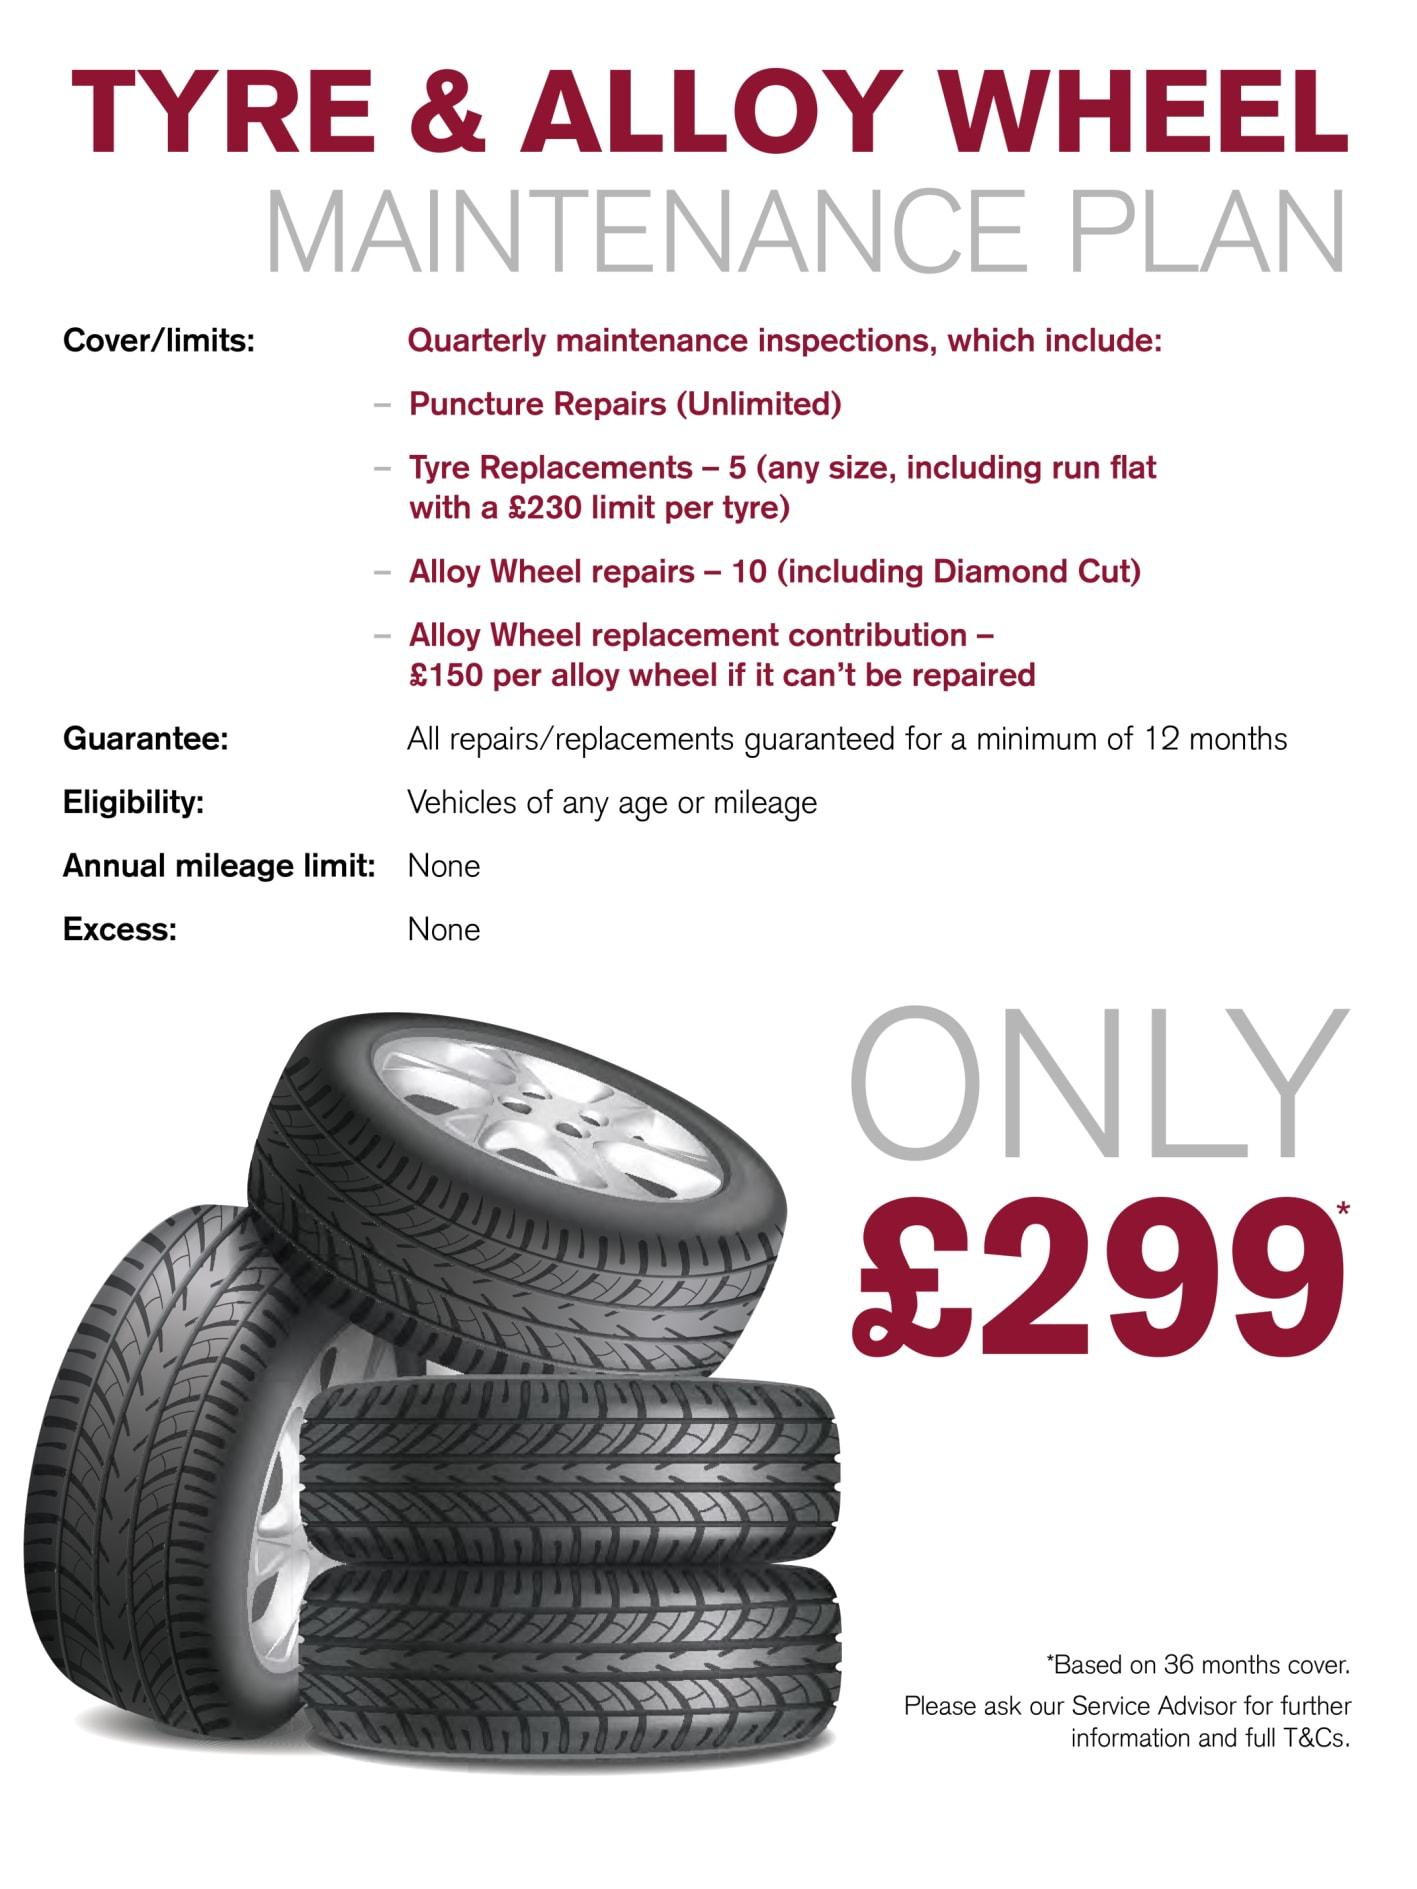 Tyre & Alloy wheel poster